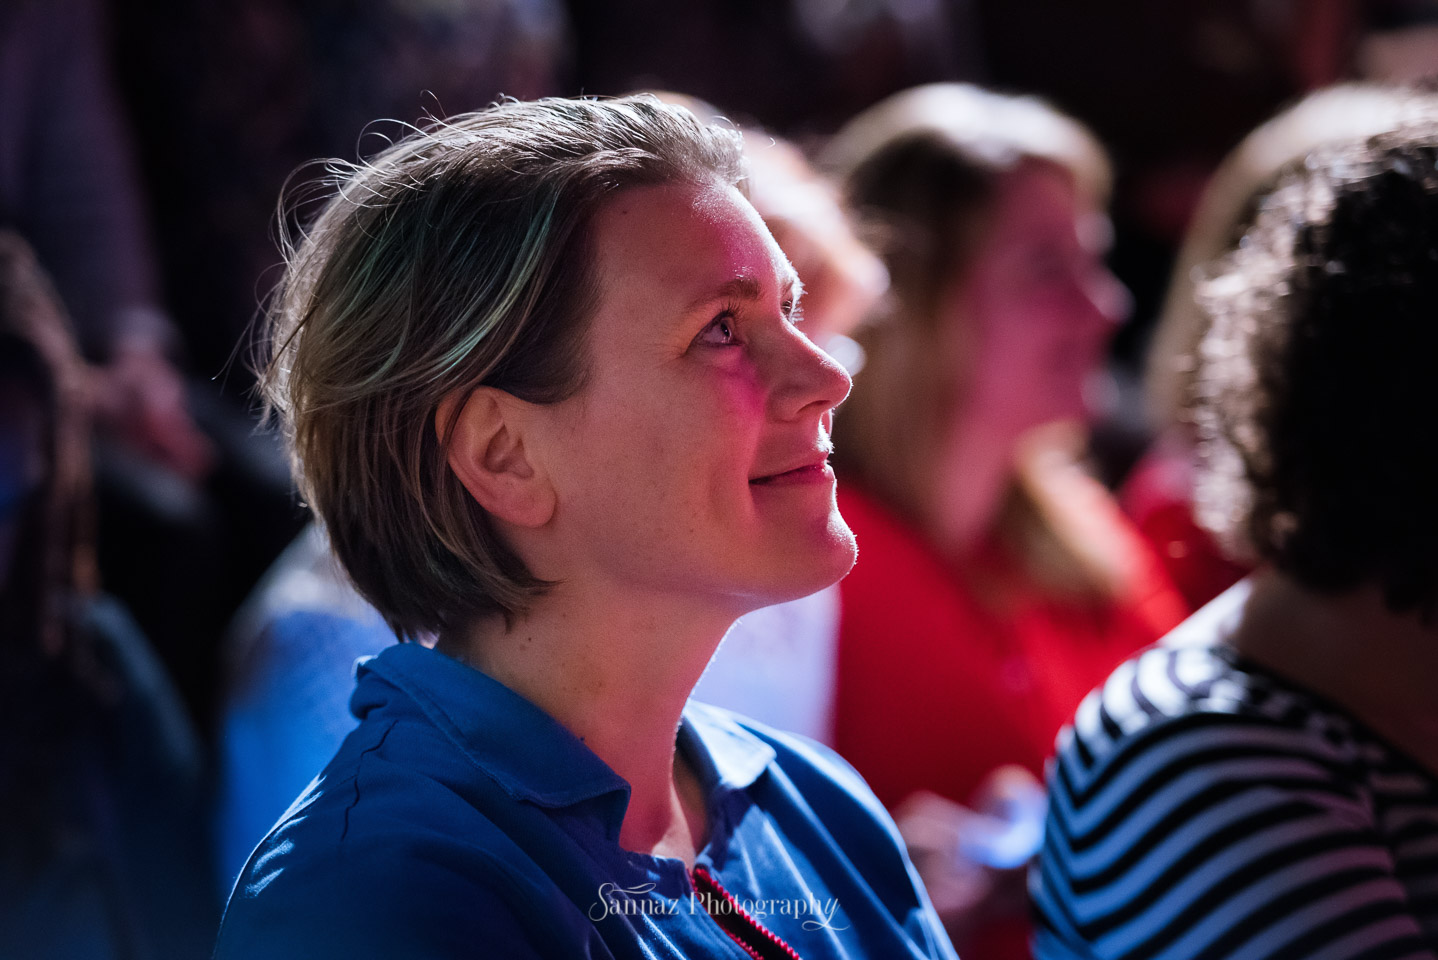 Sannaz Lisa Portengen evenementenfotograaf (8).jpg